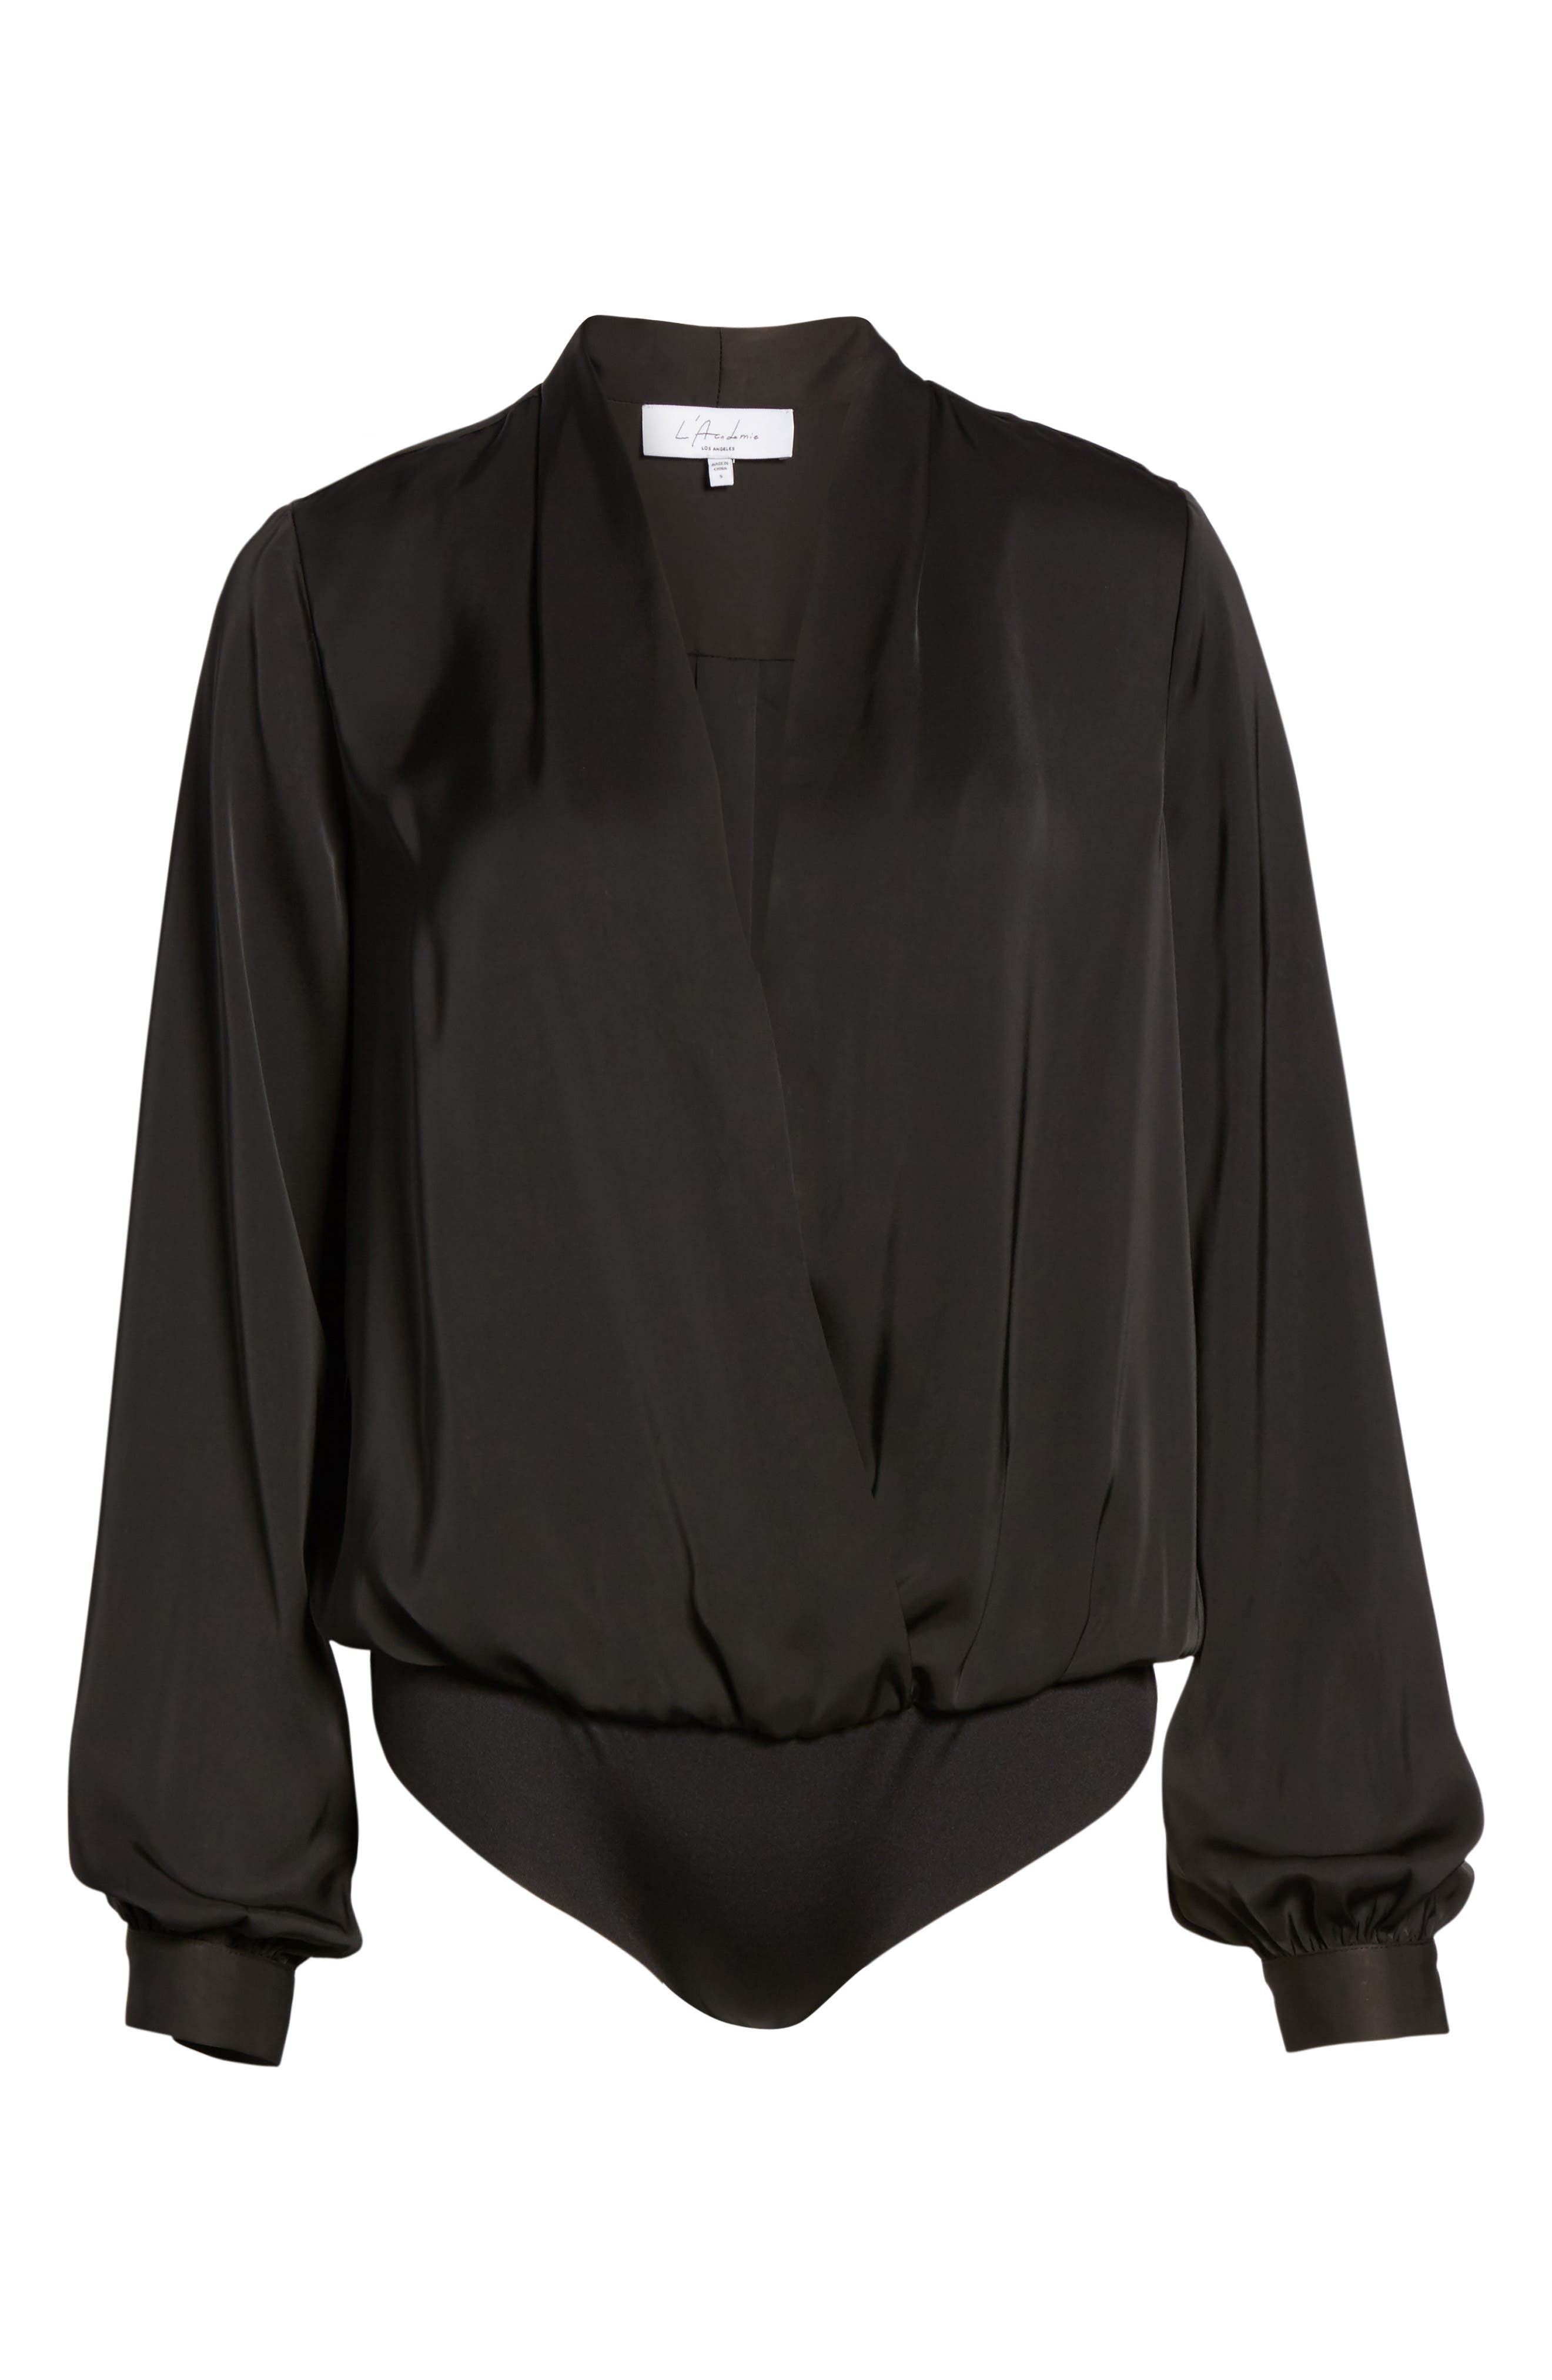 L'Academie The Long Sleeve Bodysuit,                             Alternate thumbnail 6, color,                             Black